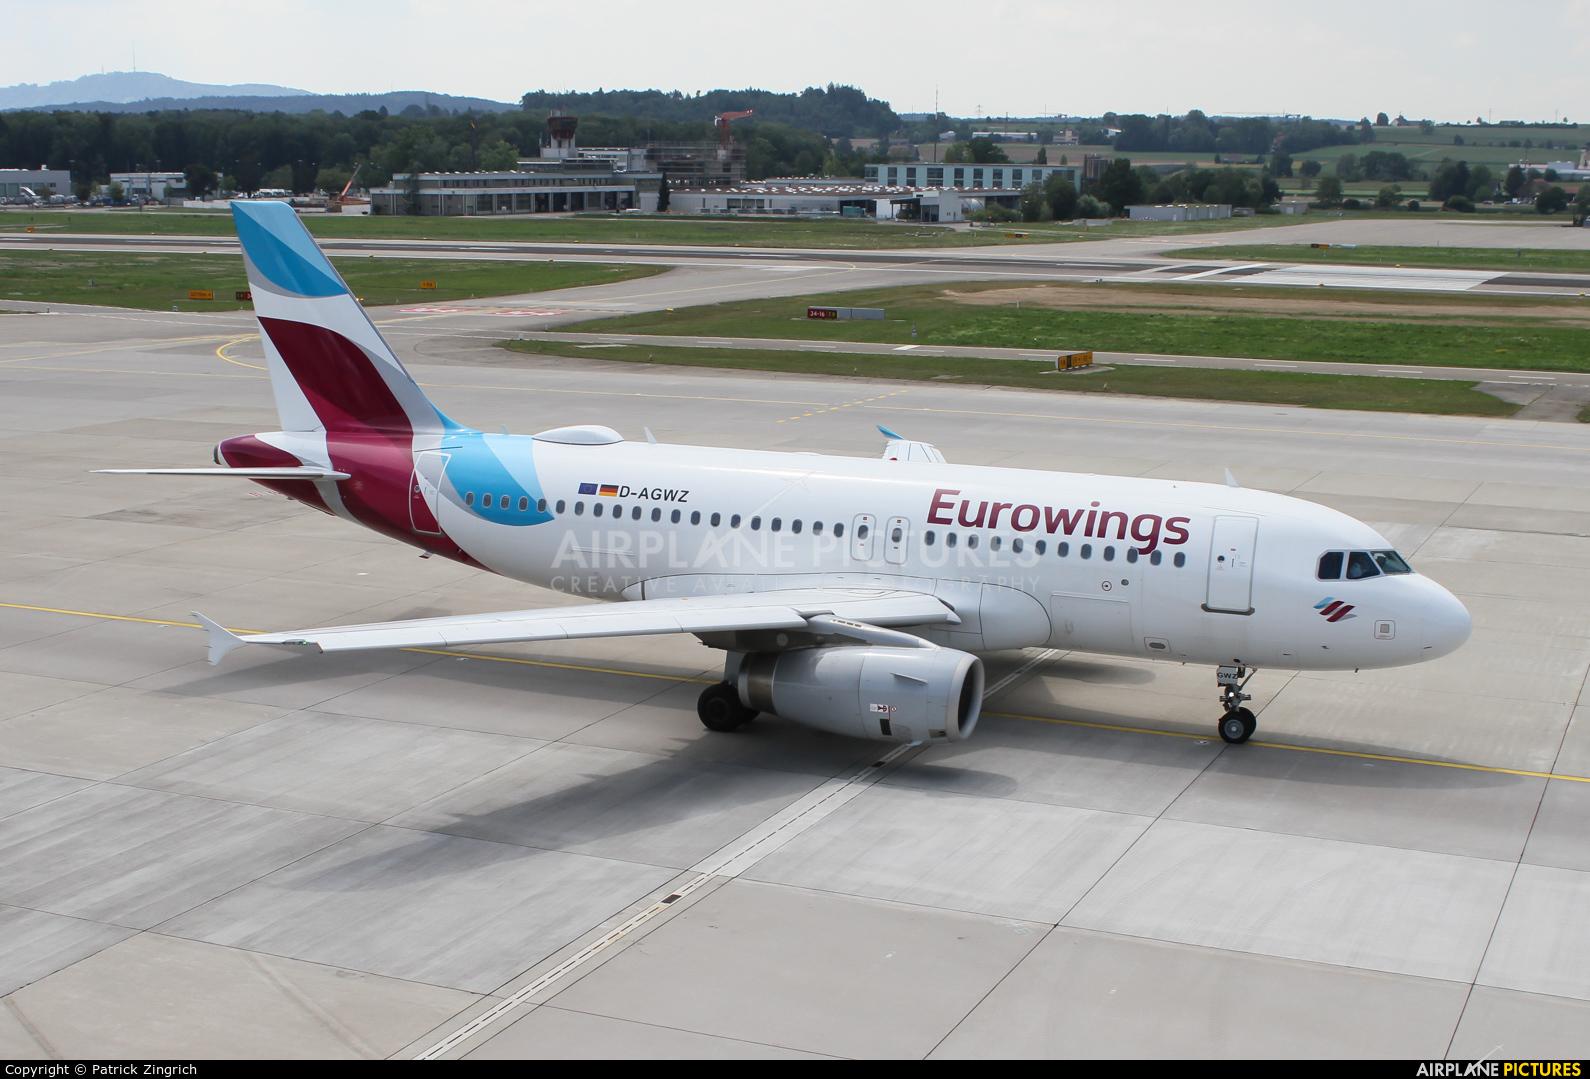 Eurowings D-AGWZ aircraft at Zurich